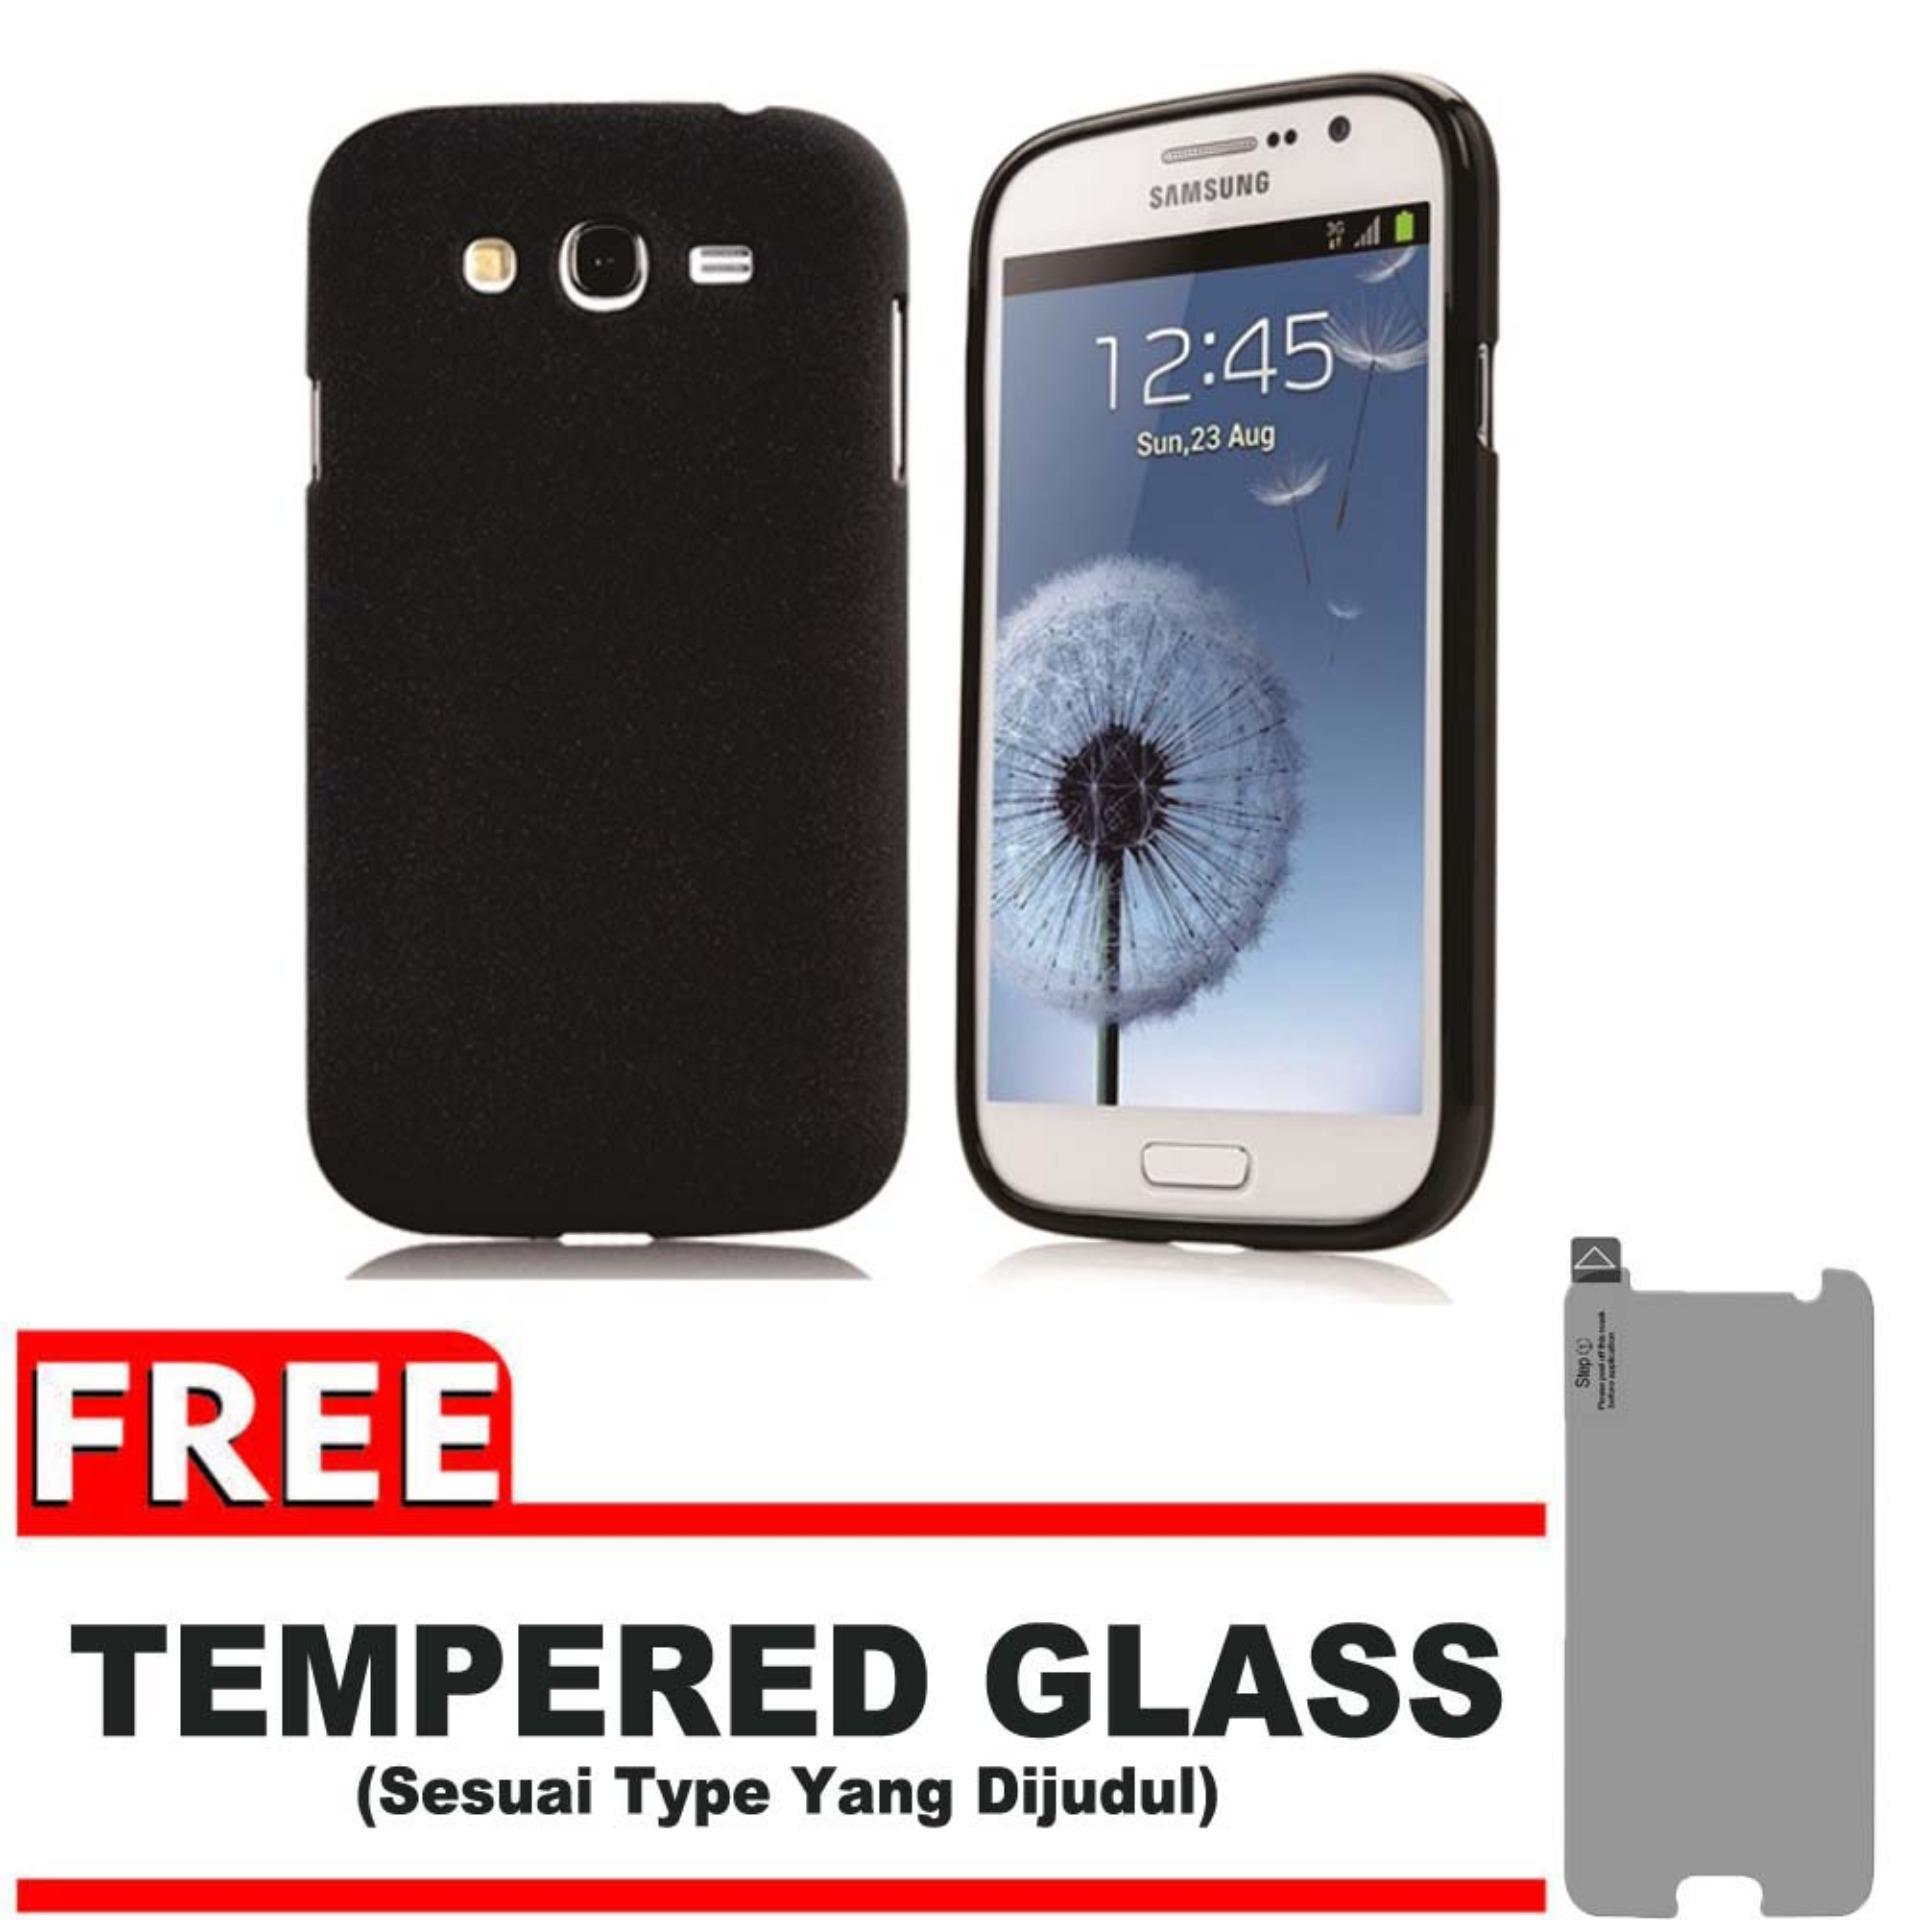 DarkNight for Samsung Galaxy Grand 1 / Neo / Plus / Duos / I9080 / I9082 / I9060 | Slim Case Black Matte Softcase Premium (Anti Minyak/Anti Sidik Jari) + Gratis Free Tempered Glass Protector - Hitam Doff